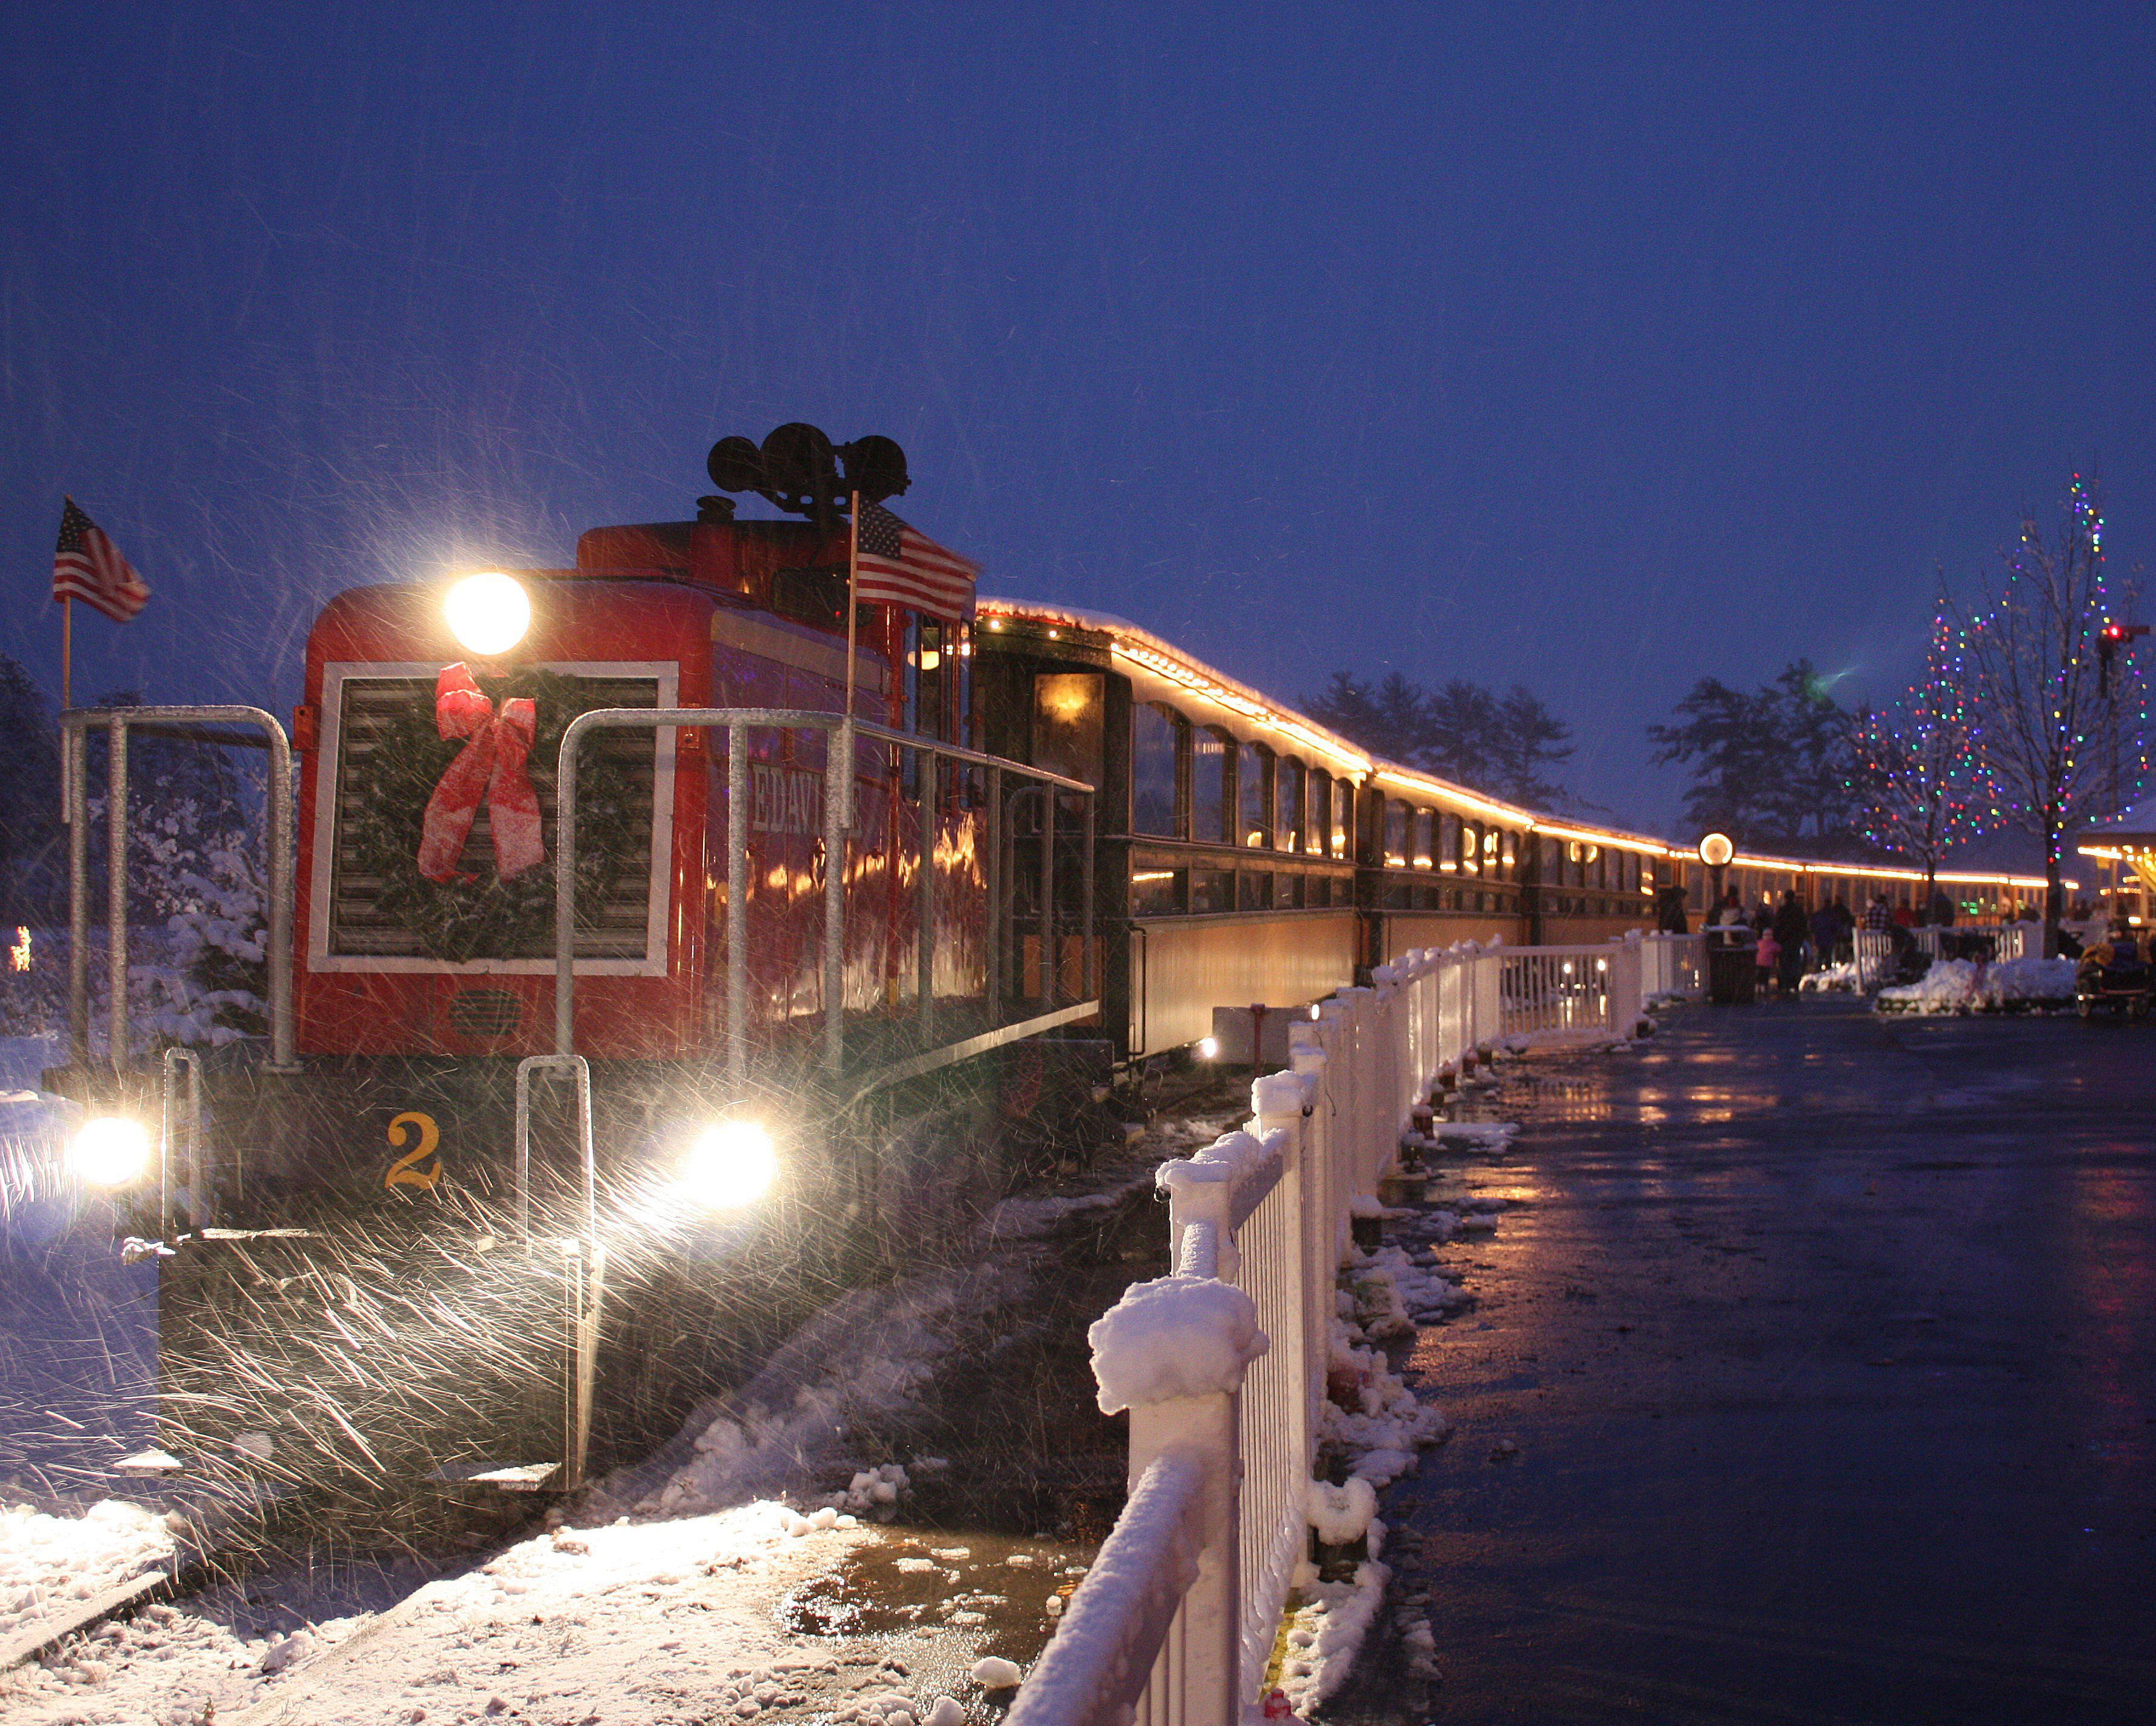 Edaville U.S.A. train at Christmas